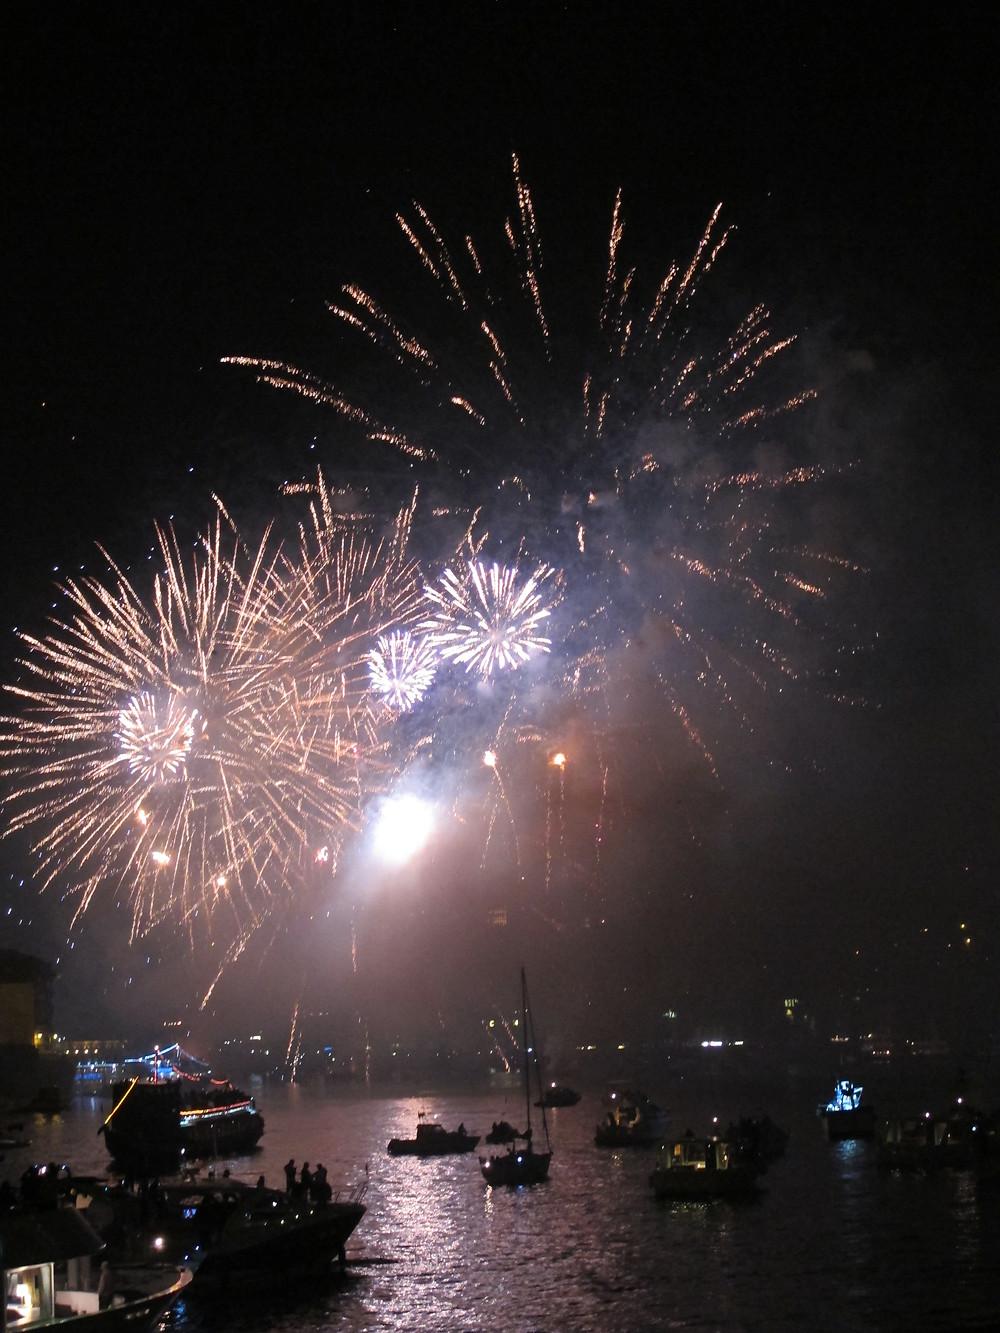 Sao Joao fireworks in Porto from the Do'uro River.